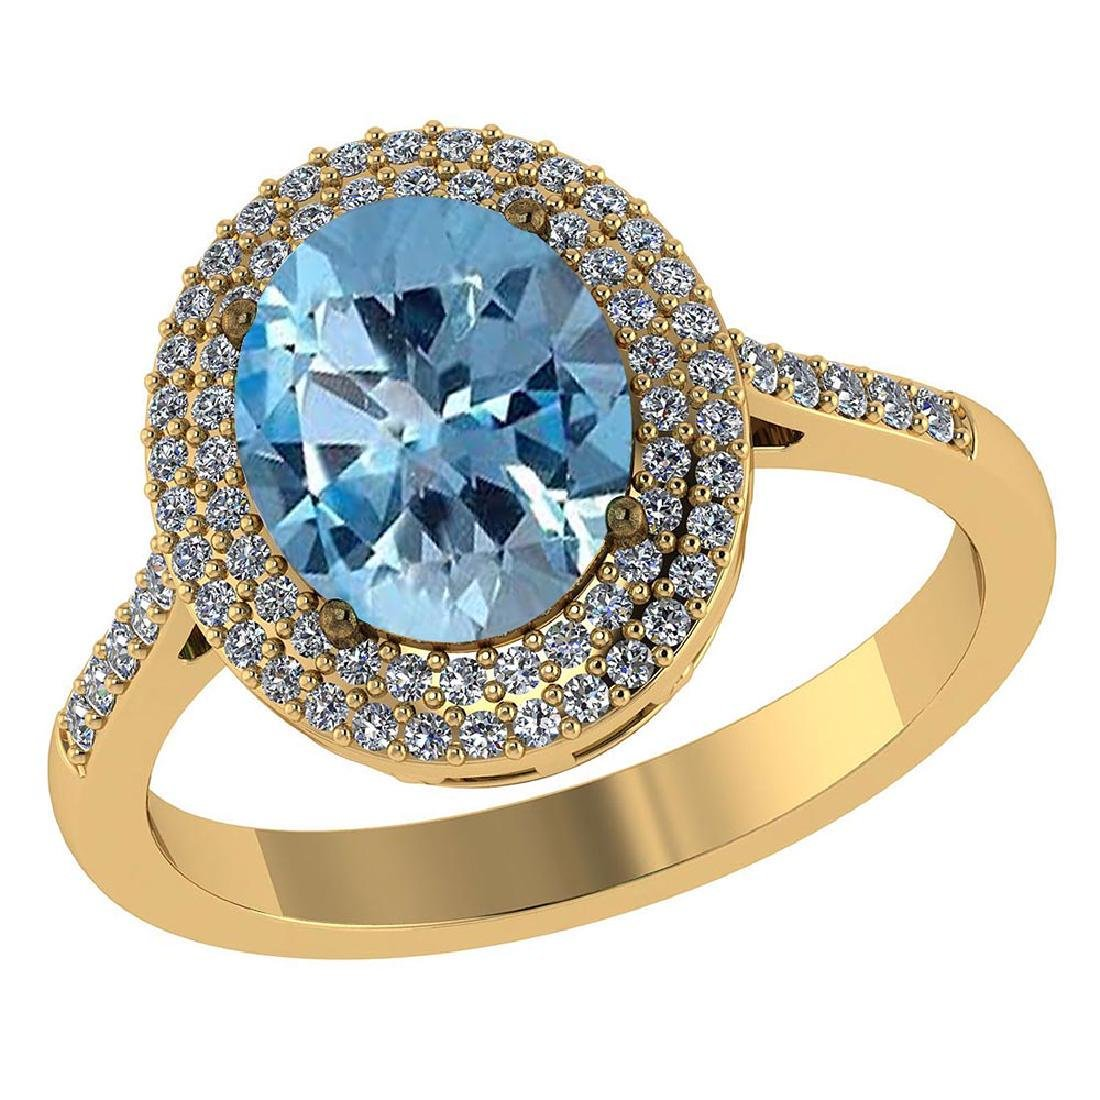 Certified 3.12 CTW Genuine Aquamarine And Diamond 14K Y